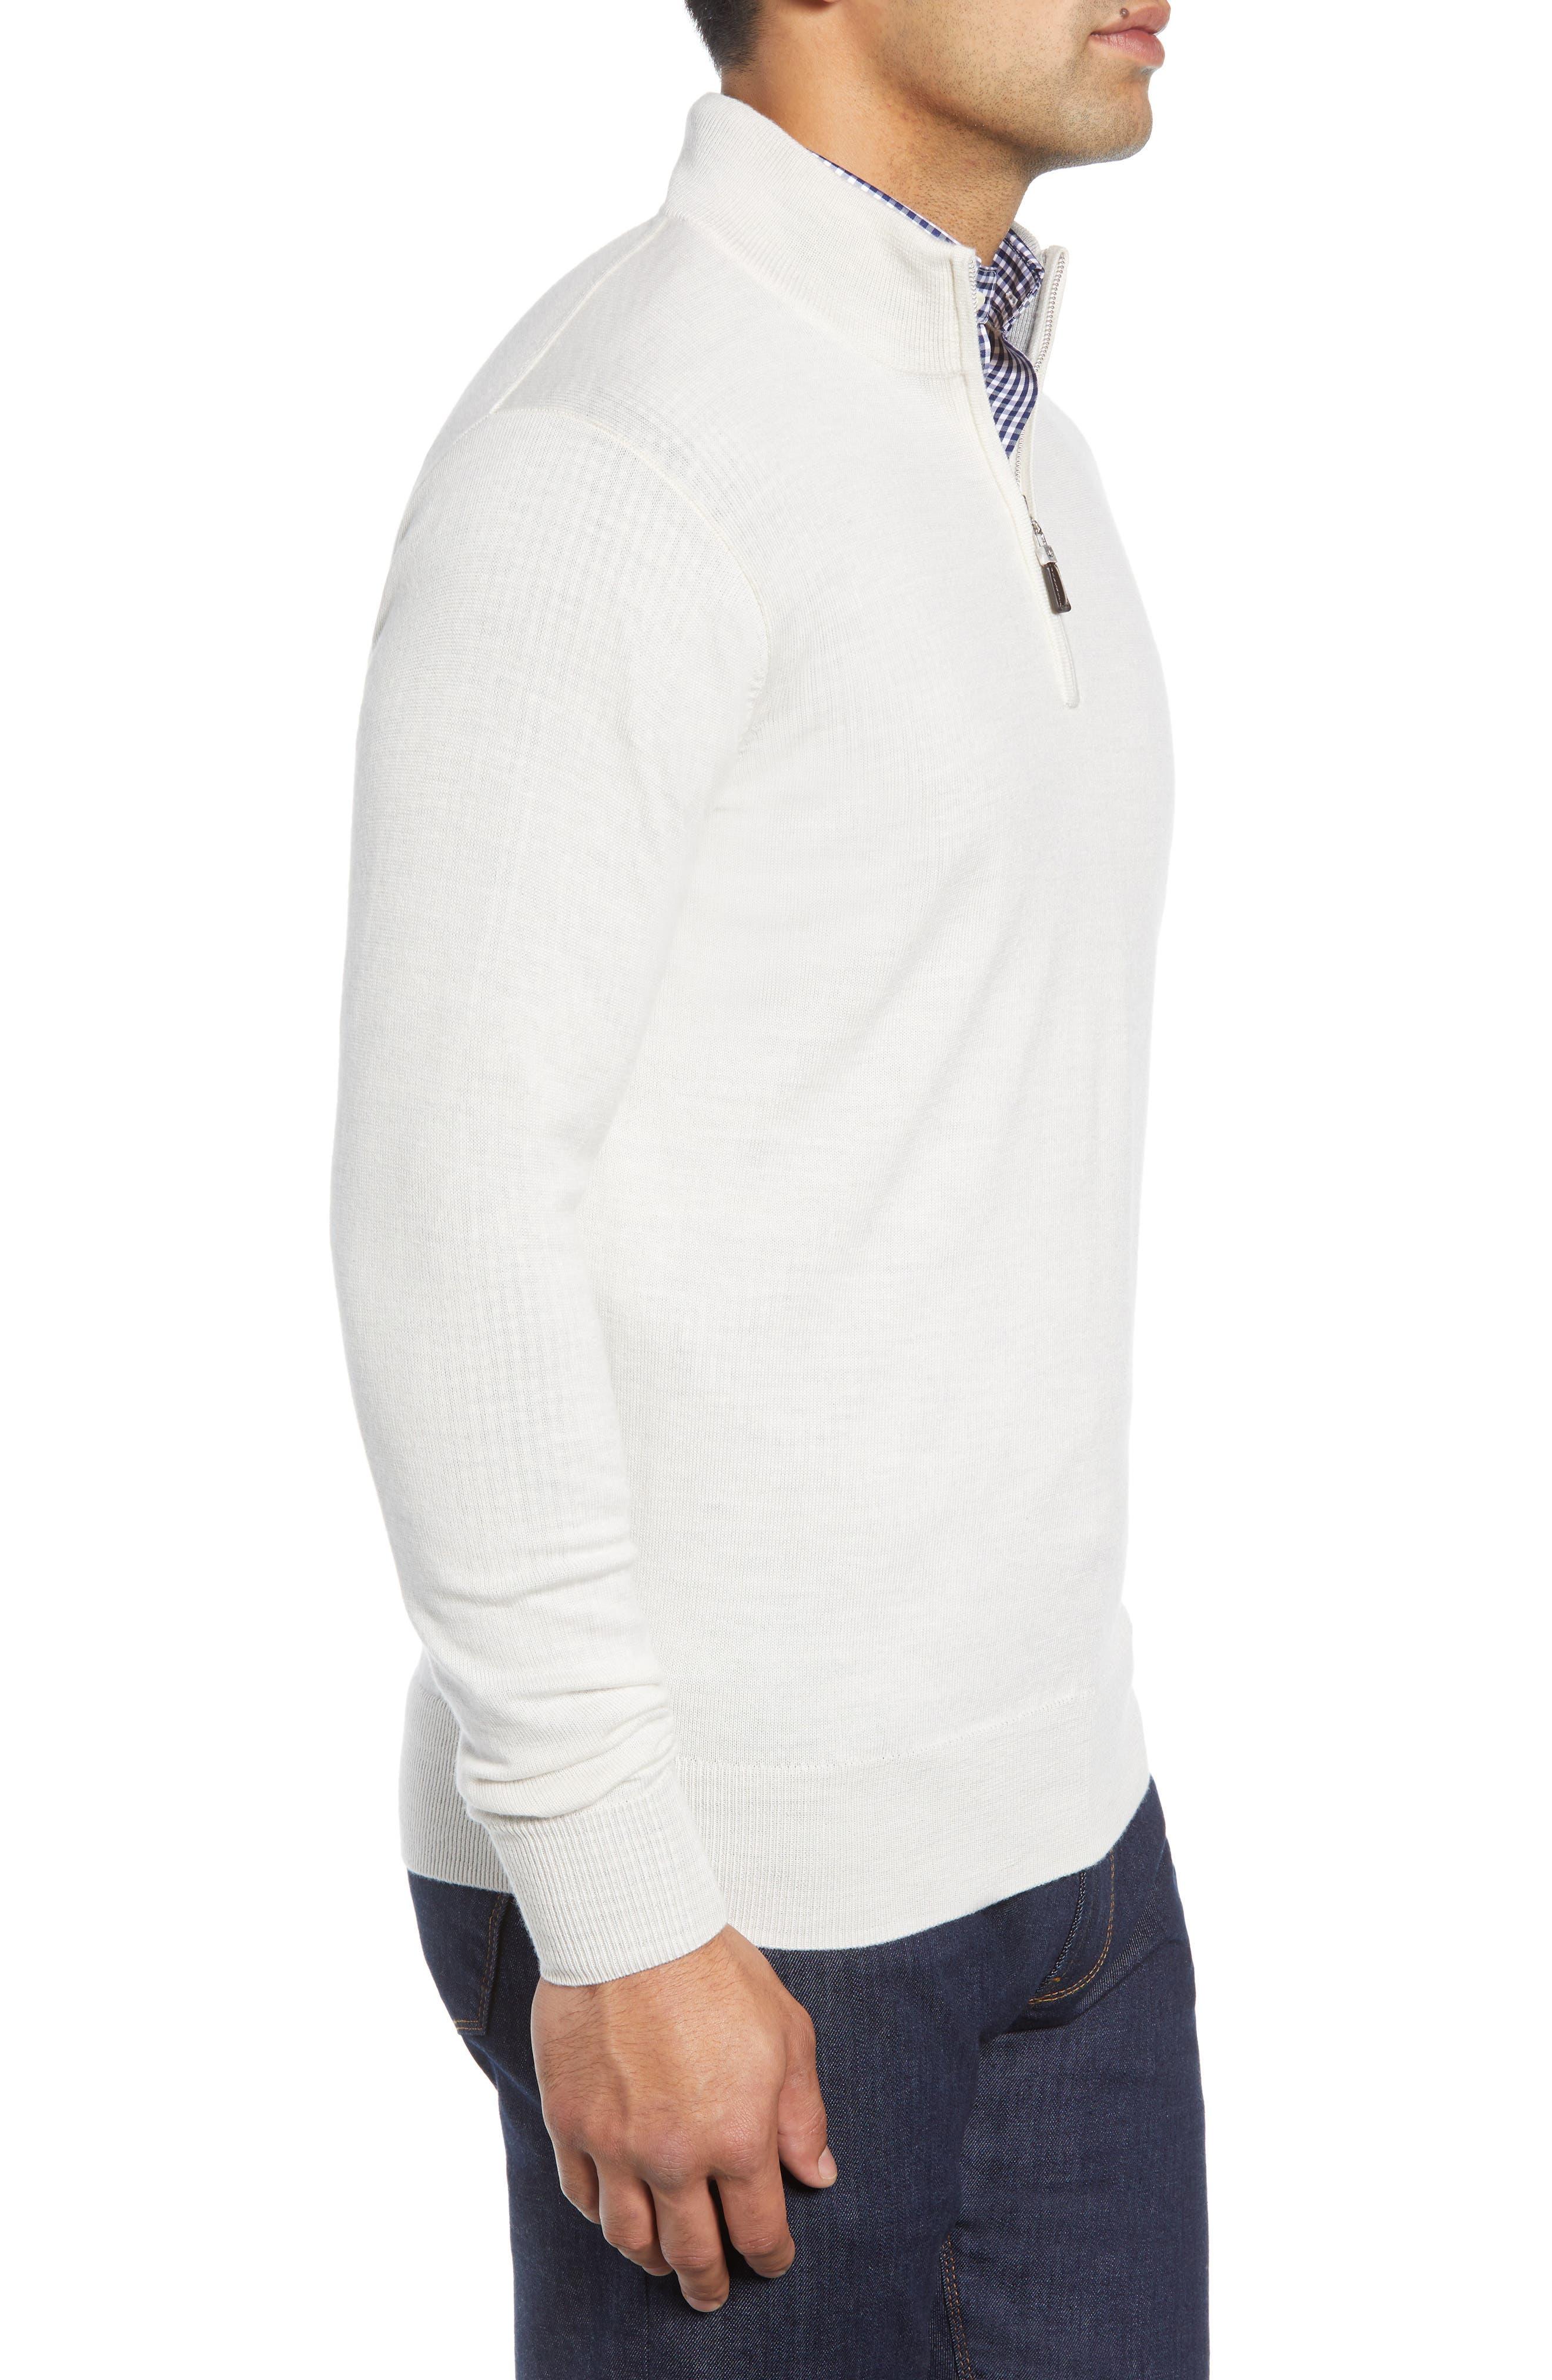 Crown Soft Regular Fit Wool Blend Quarter Zip Sweater,                             Alternate thumbnail 3, color,                             WHITE